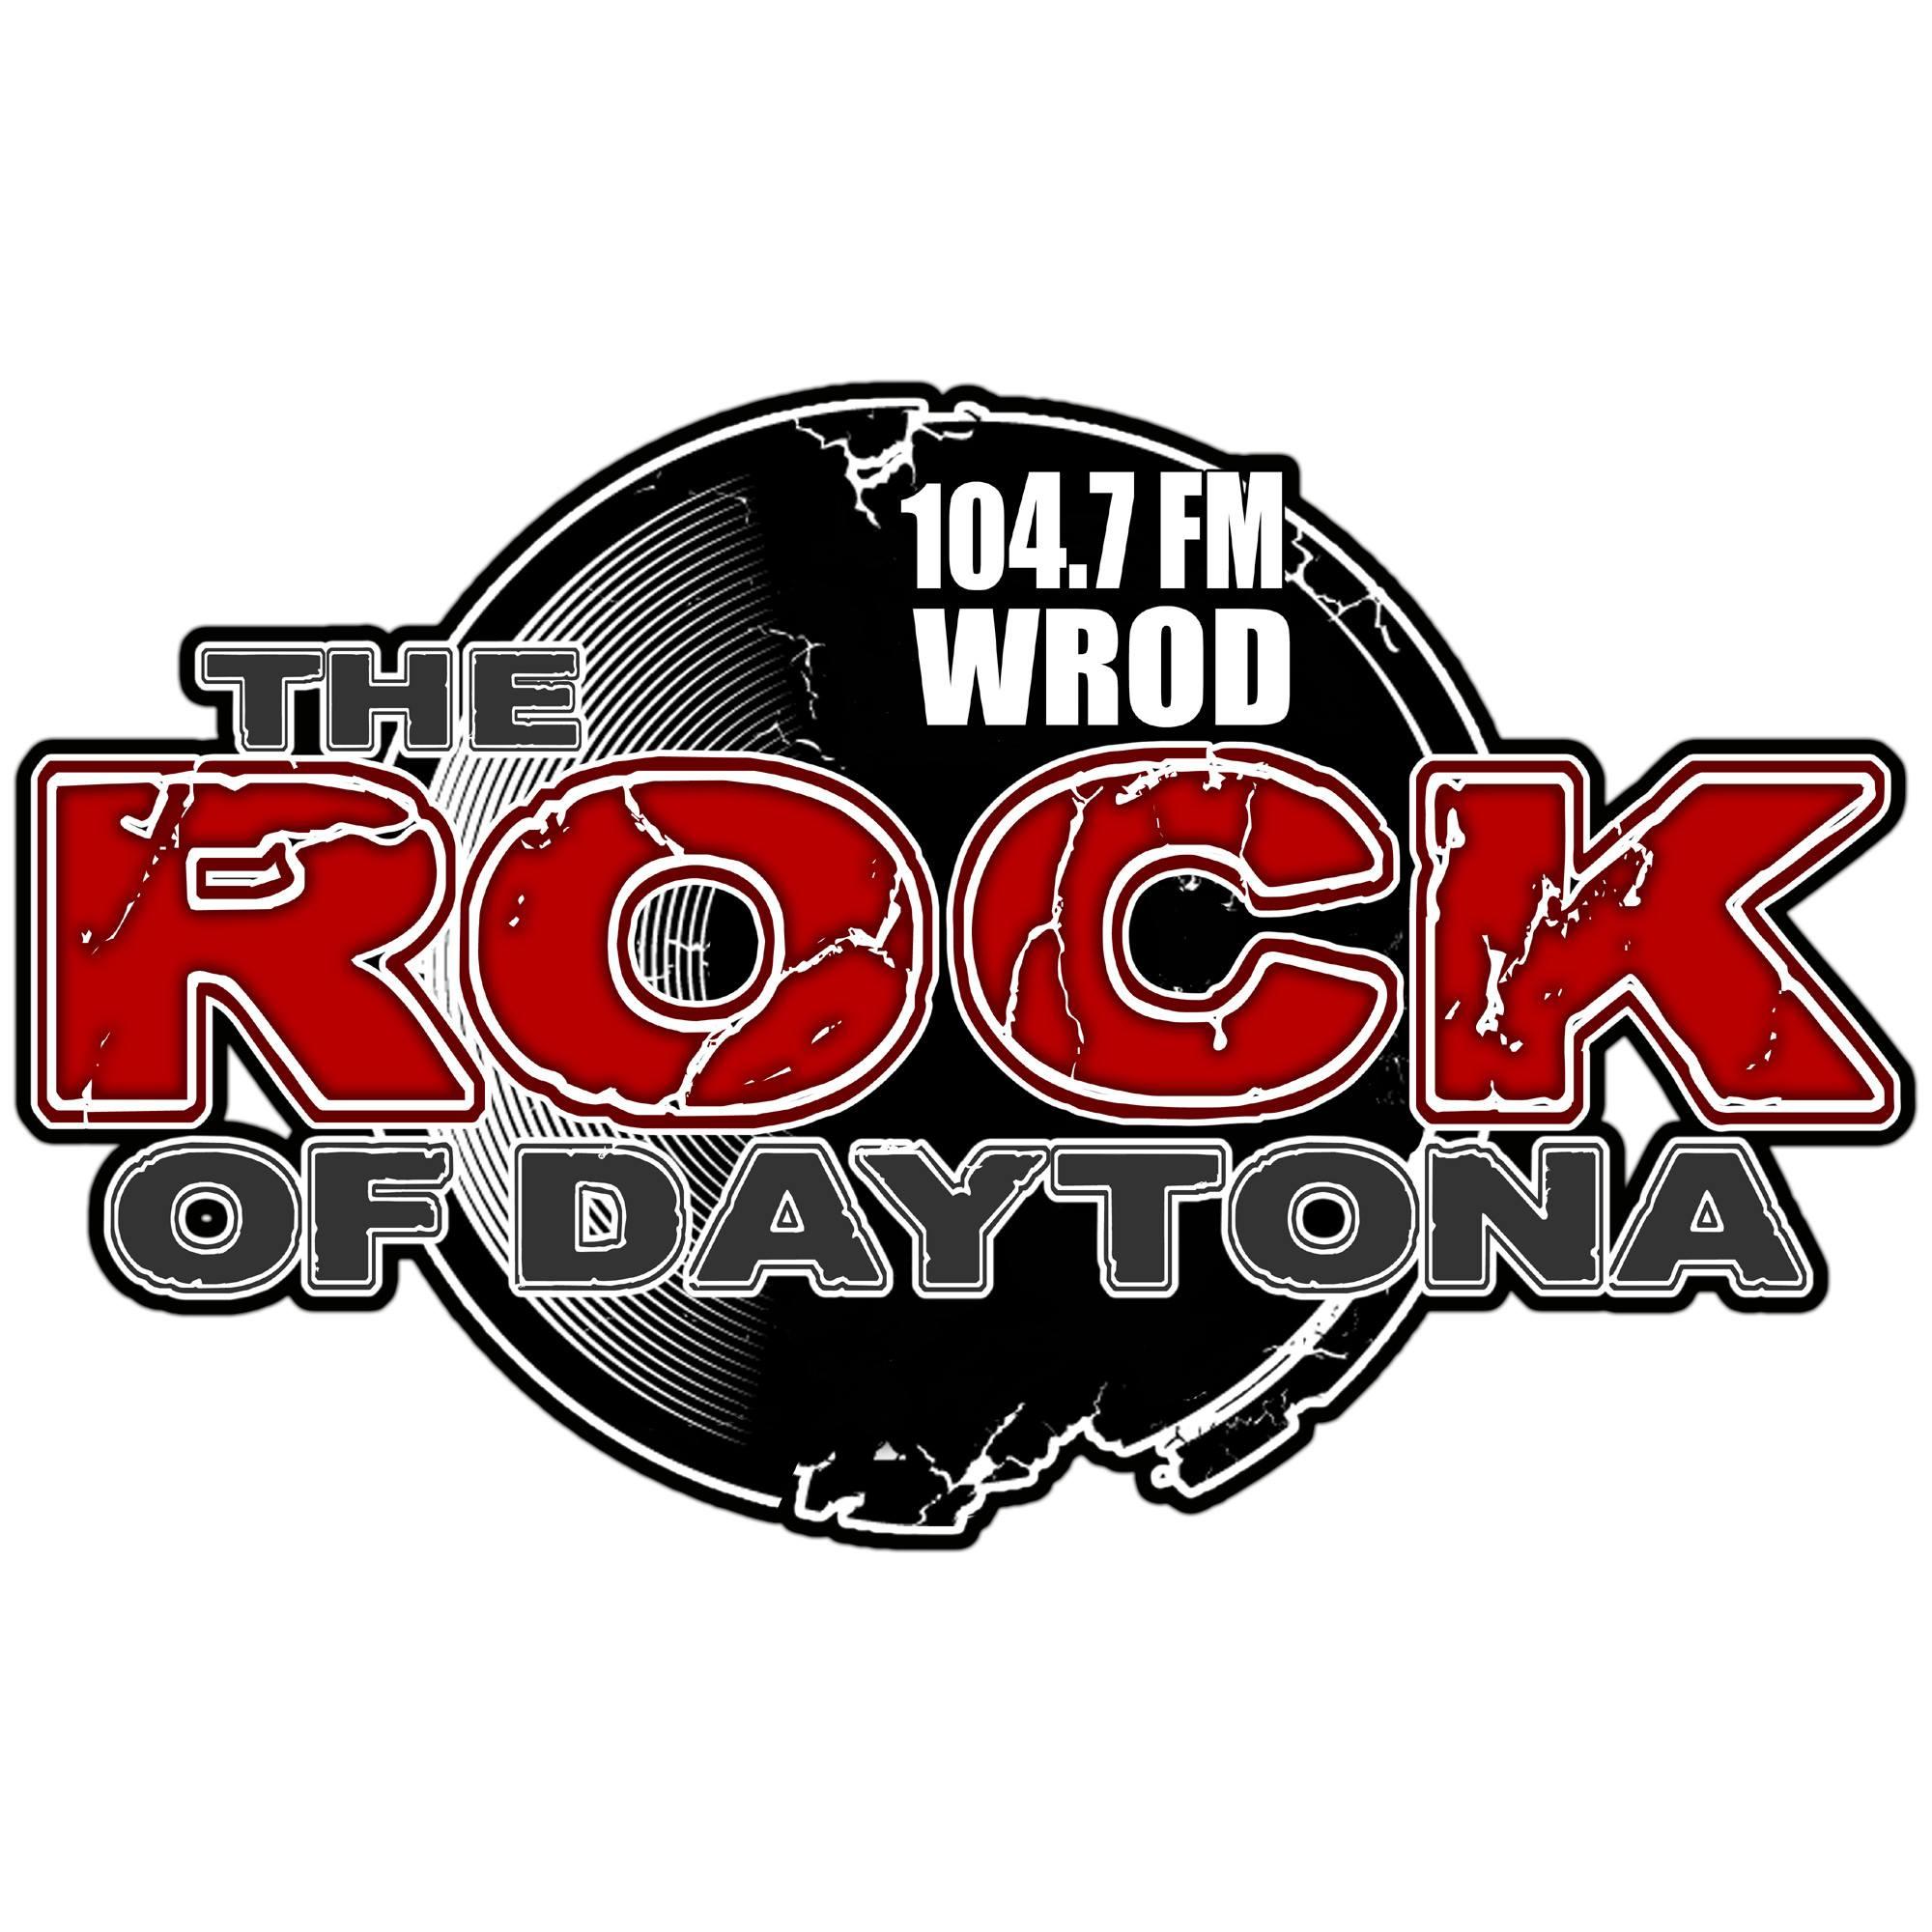 WROD - The Rock of Daytona